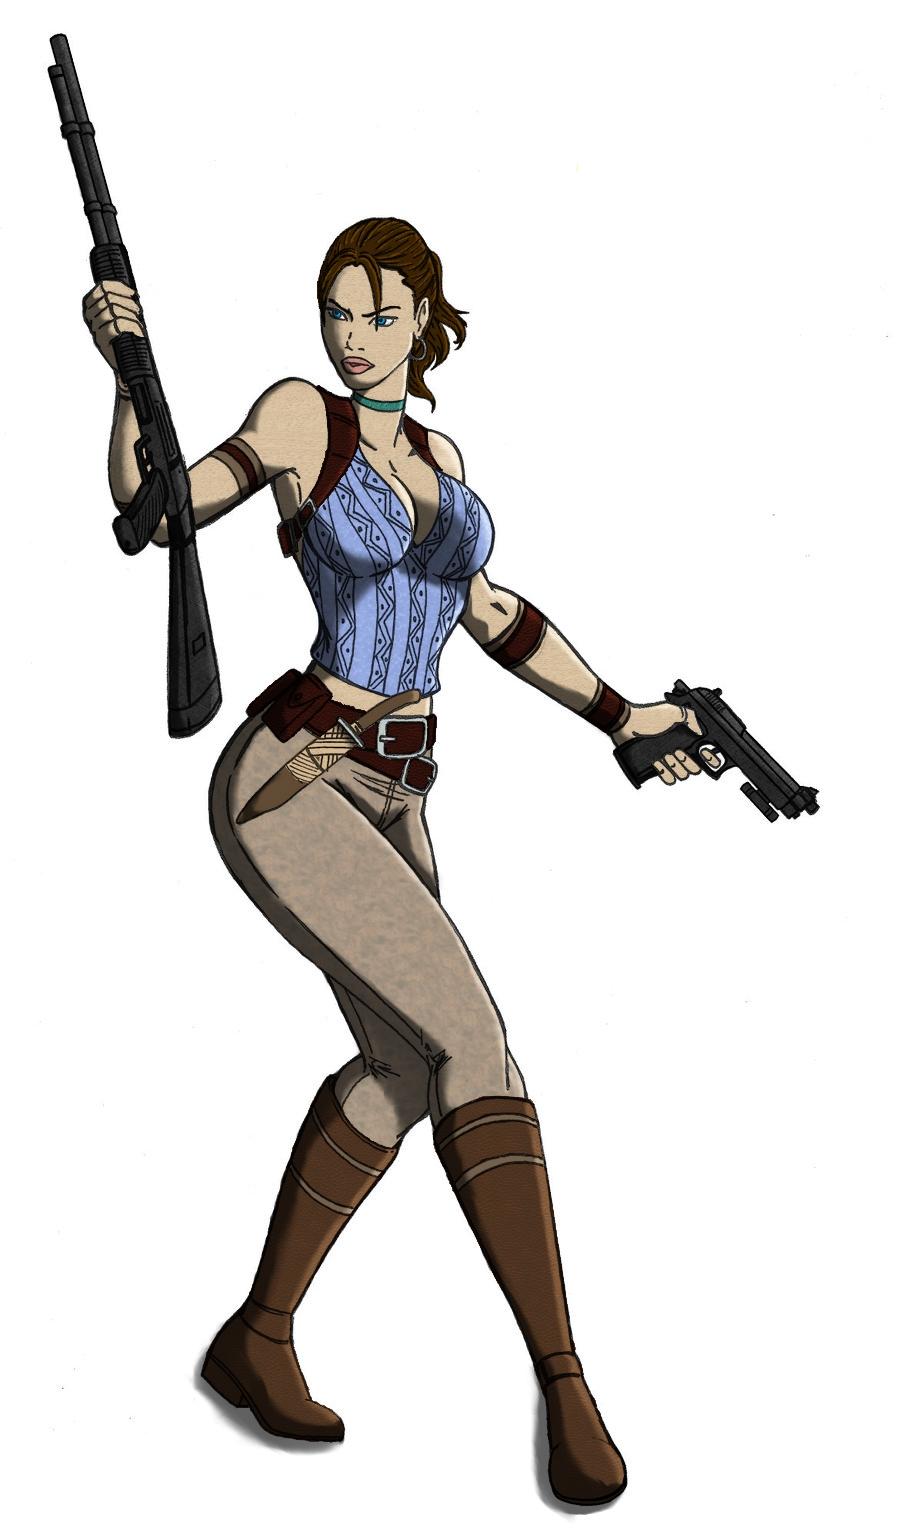 Resident evil 5 sheva cloning mods erotic scenes